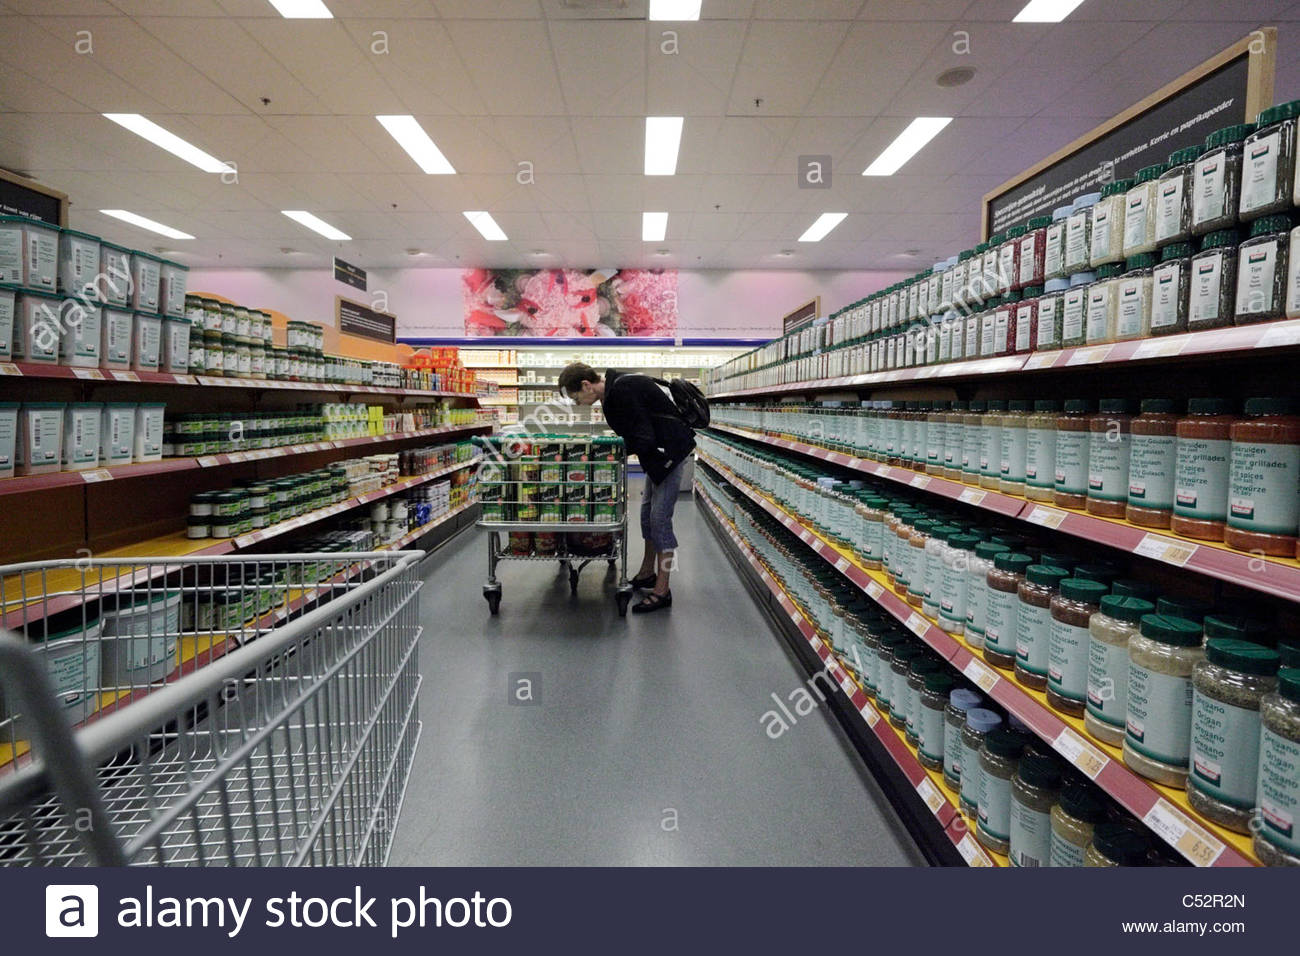 Wholesale Supermarket Stock Photos & Wholesale Supermarket